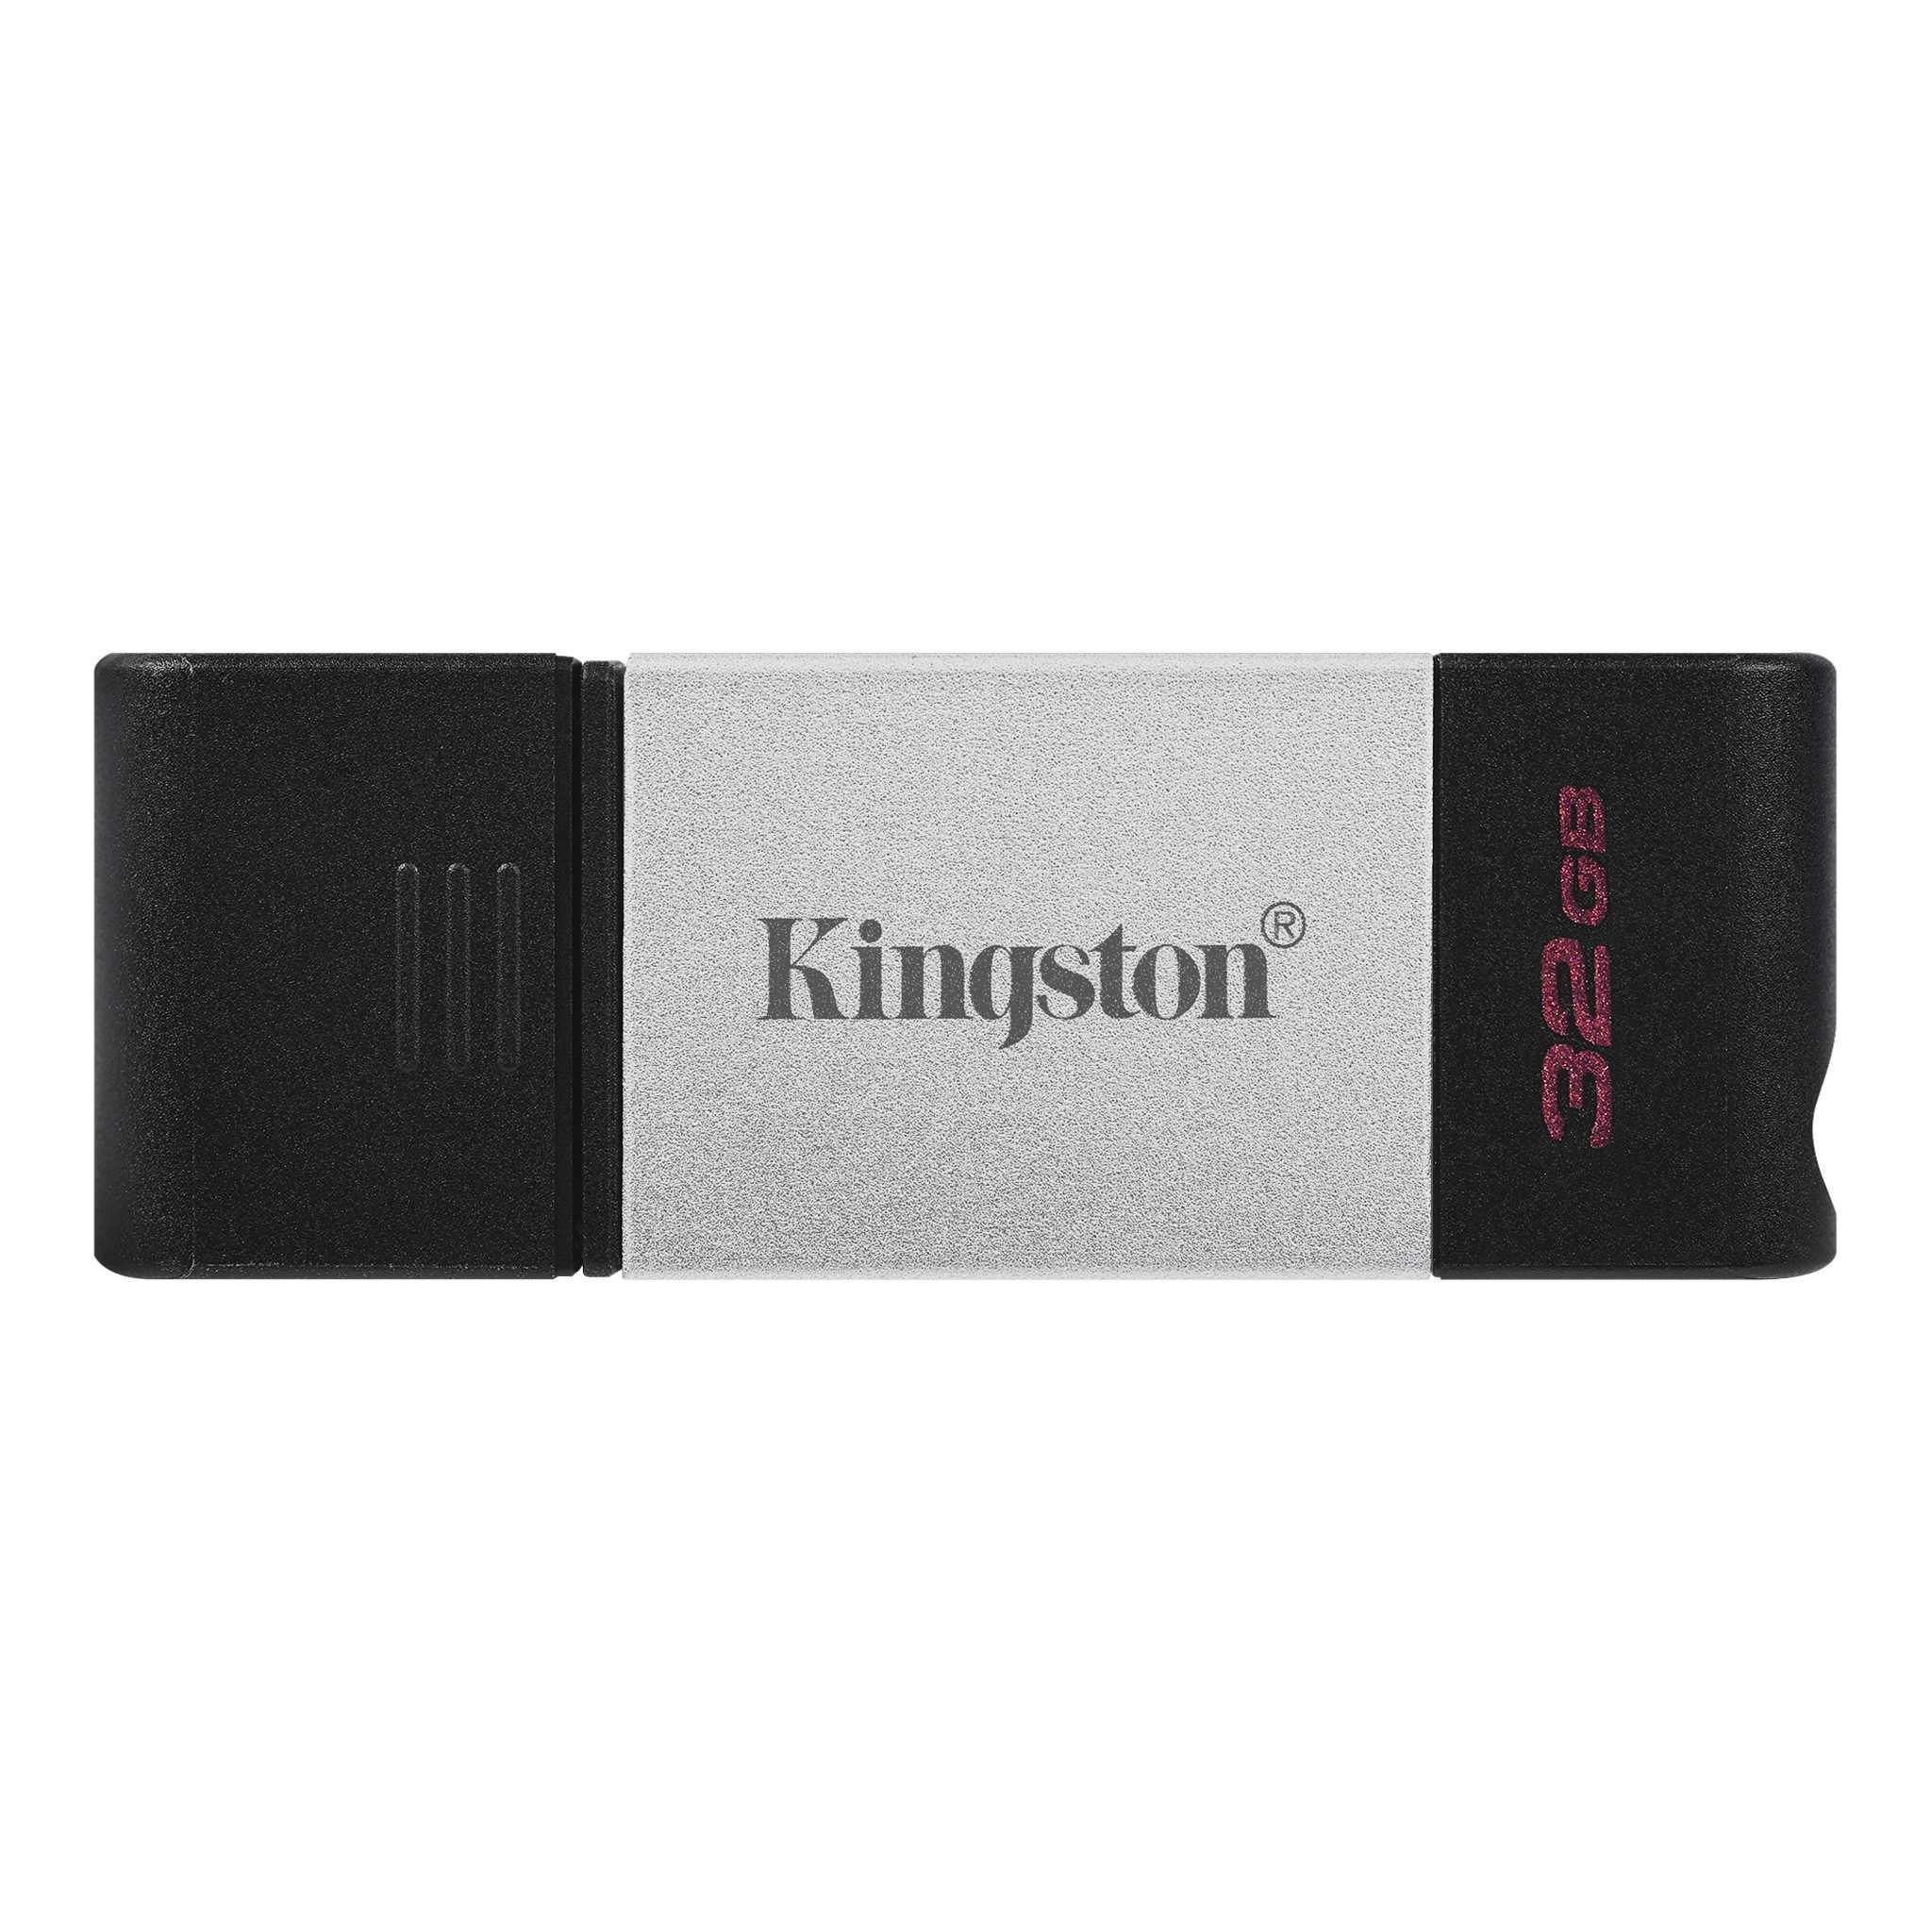 USB памет KINGSTON DataTraveler 80, 32GB, USB-C 3.2 Gen 1, Черна-2